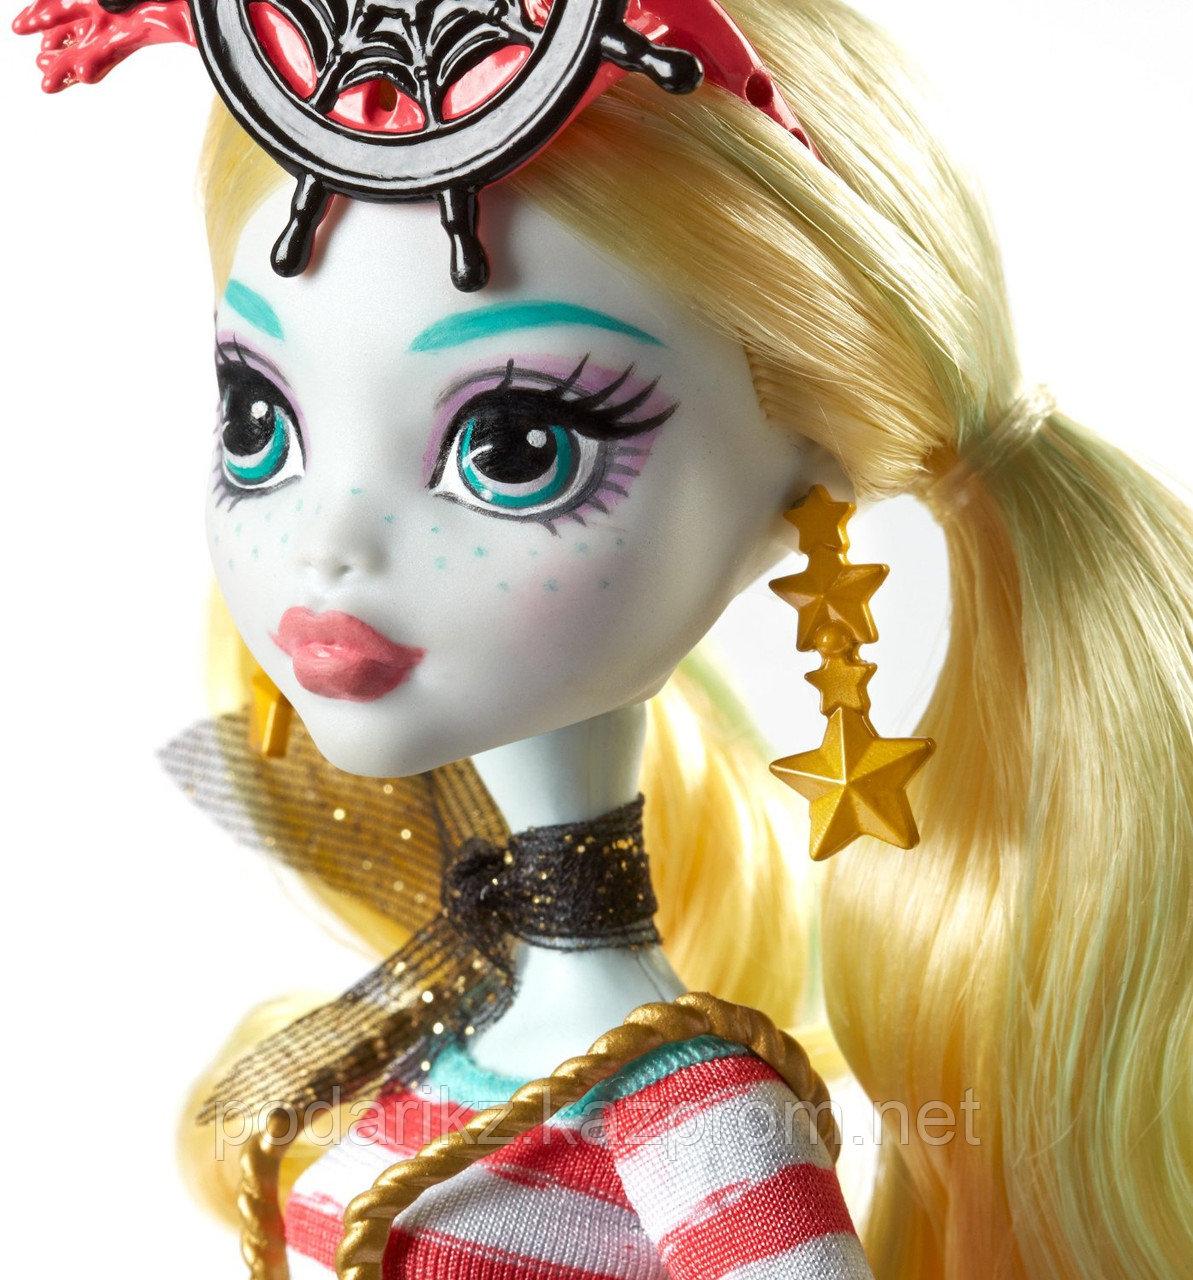 Куклы монстер хай Лагуна Блю, Monster High Shriekwrecked Lagoona Blue - фото 6